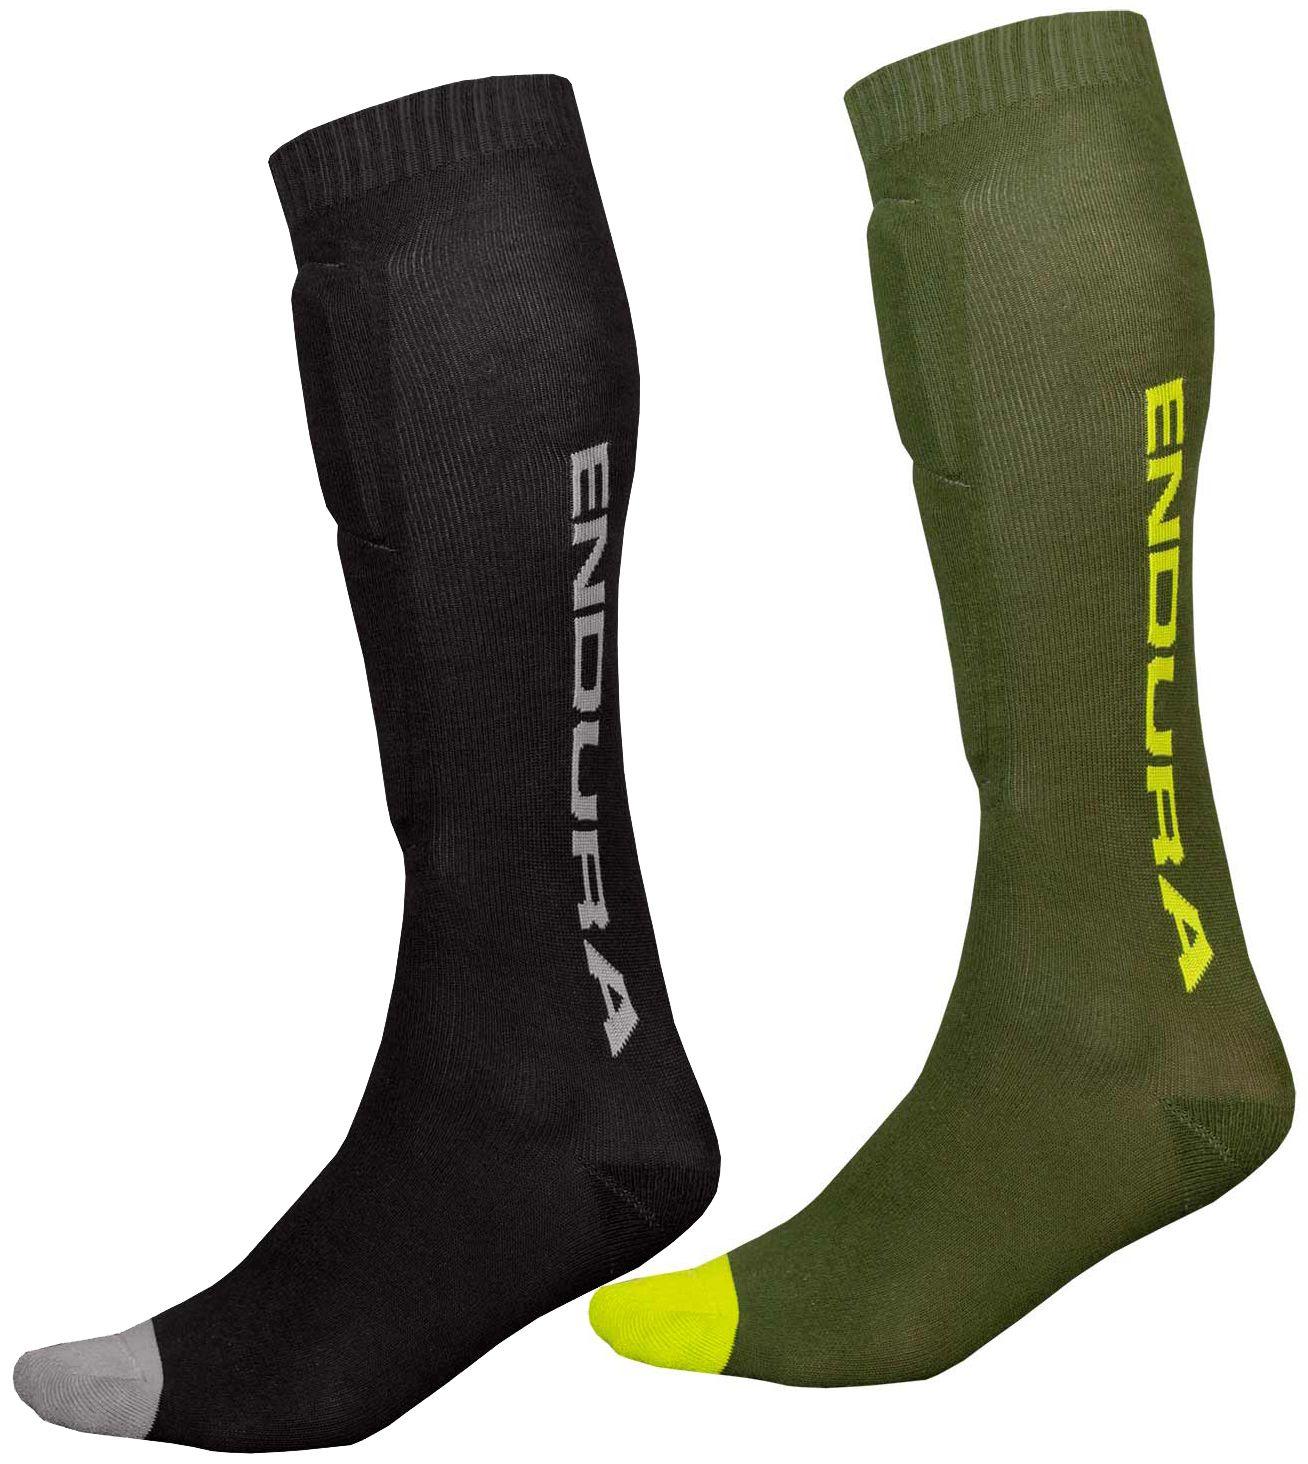 Endura Singletrack Shin Guard Sock | Beskyttelse